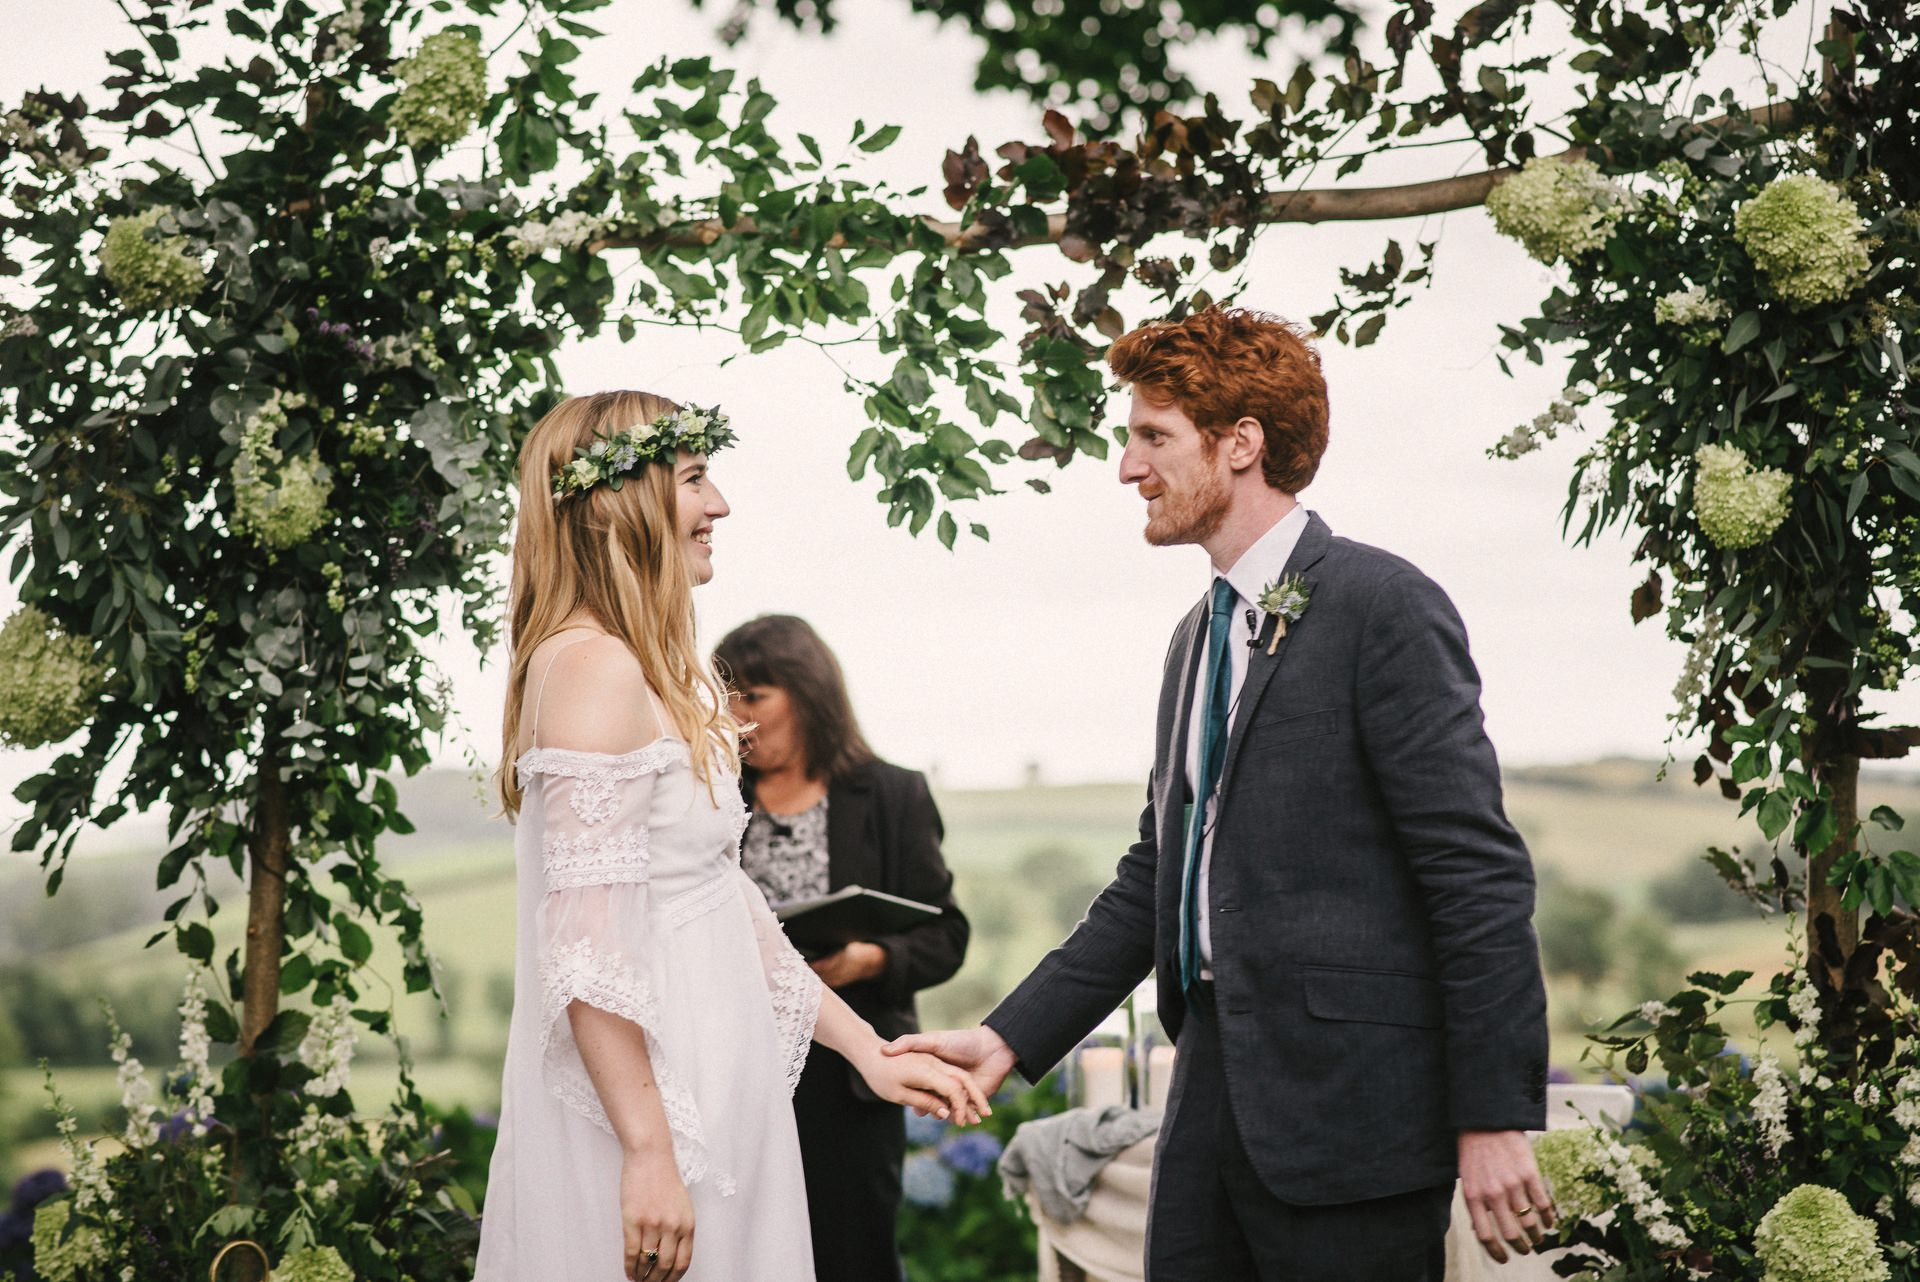 wedding at tullyveery house045.JPG